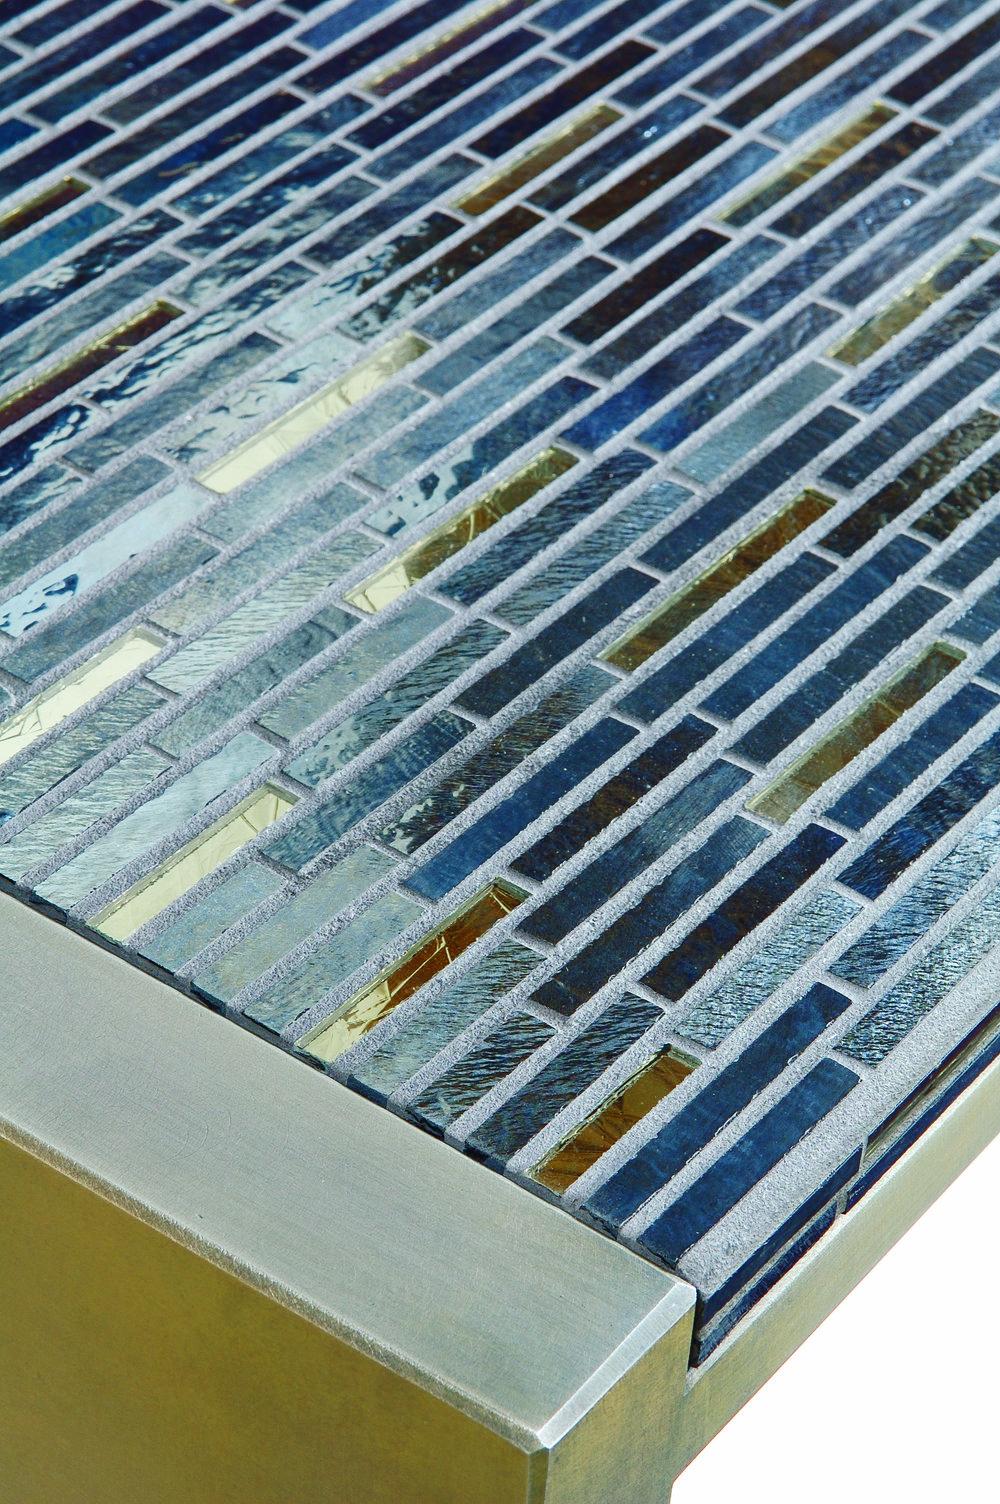 mosaicdetails.jpg